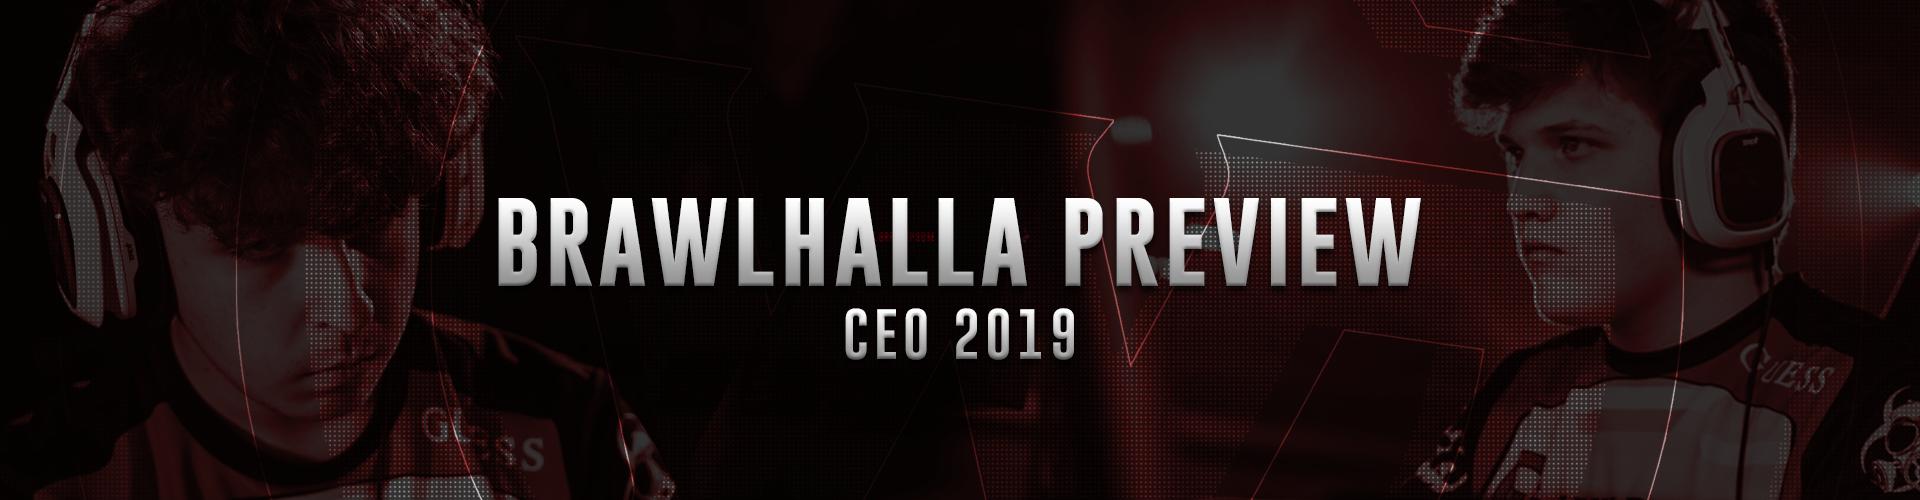 Brawlhalla Preview: CEO 2019